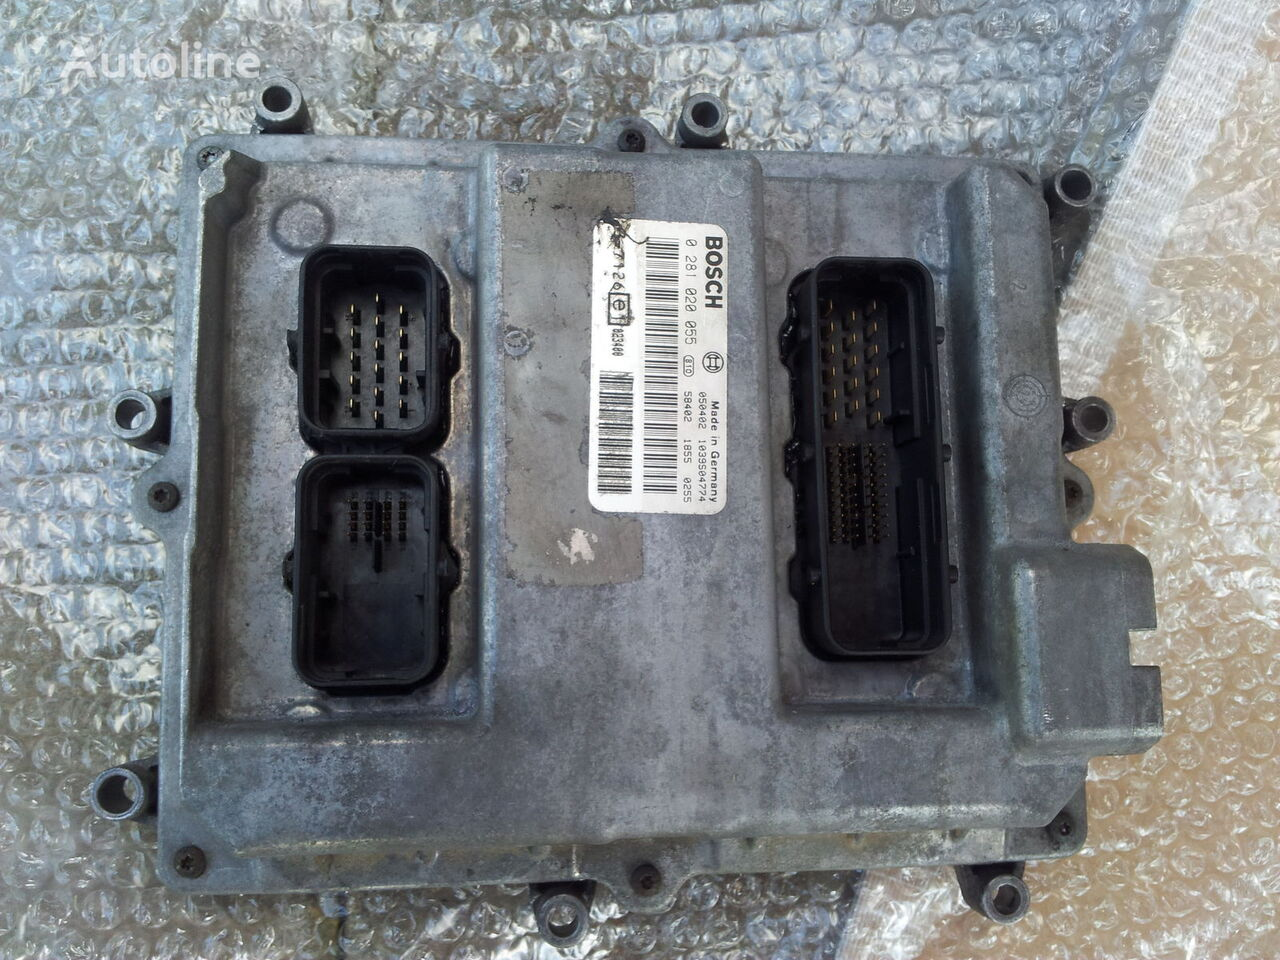 MAN Common Rail EDC, ECU electronic diesel control 0281020055, D2066LF01, 51258037126, 51258337169, 51258037127, 51258337168 Steuereinheit für MAN TGA Sattelzugmaschine